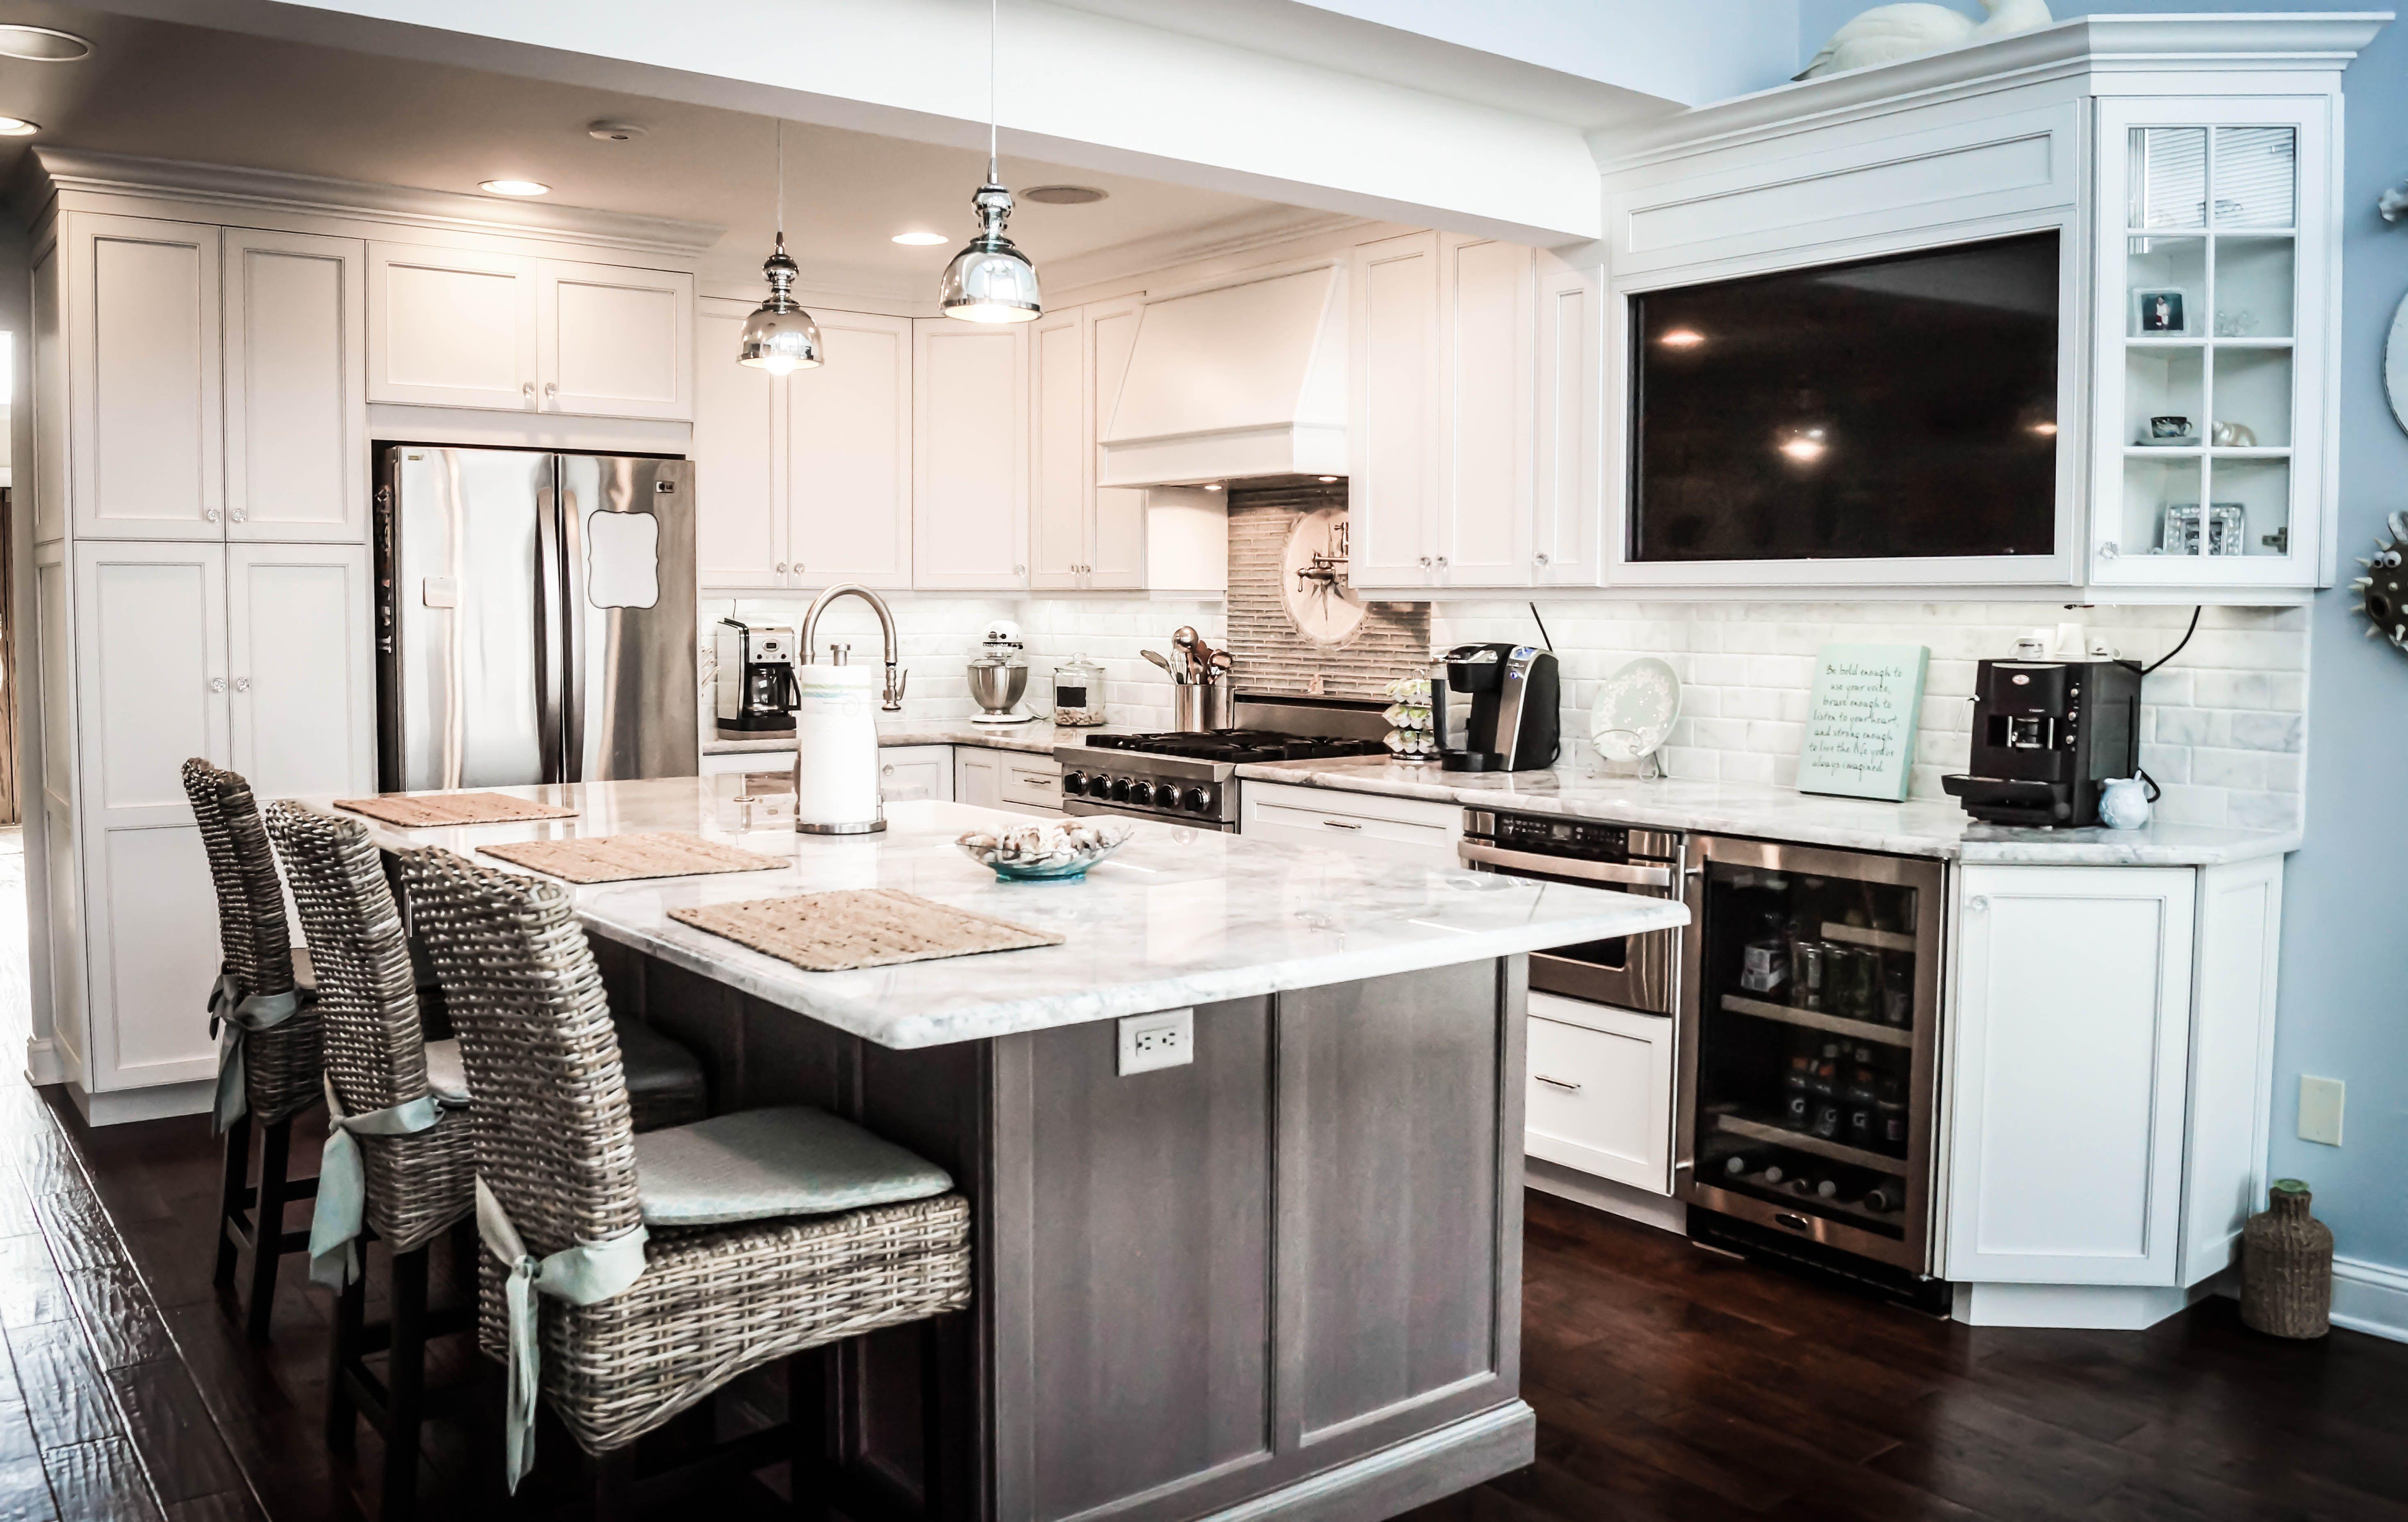 The Well Designed Kitchen in Brick   Wellness design ...